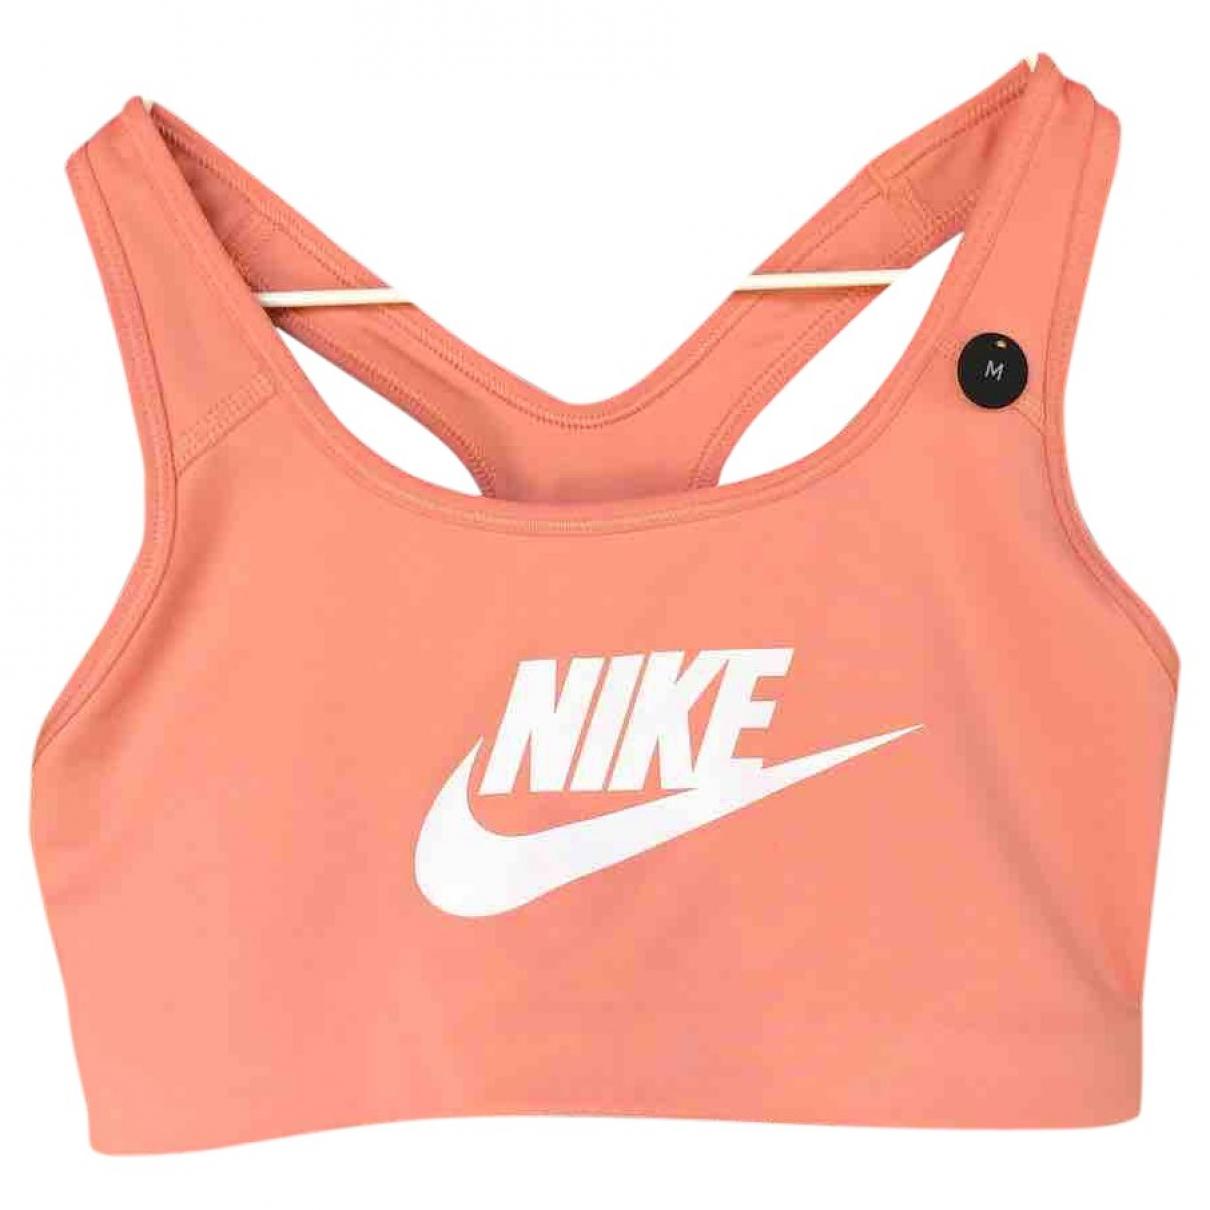 Nike \N  top for Women M International